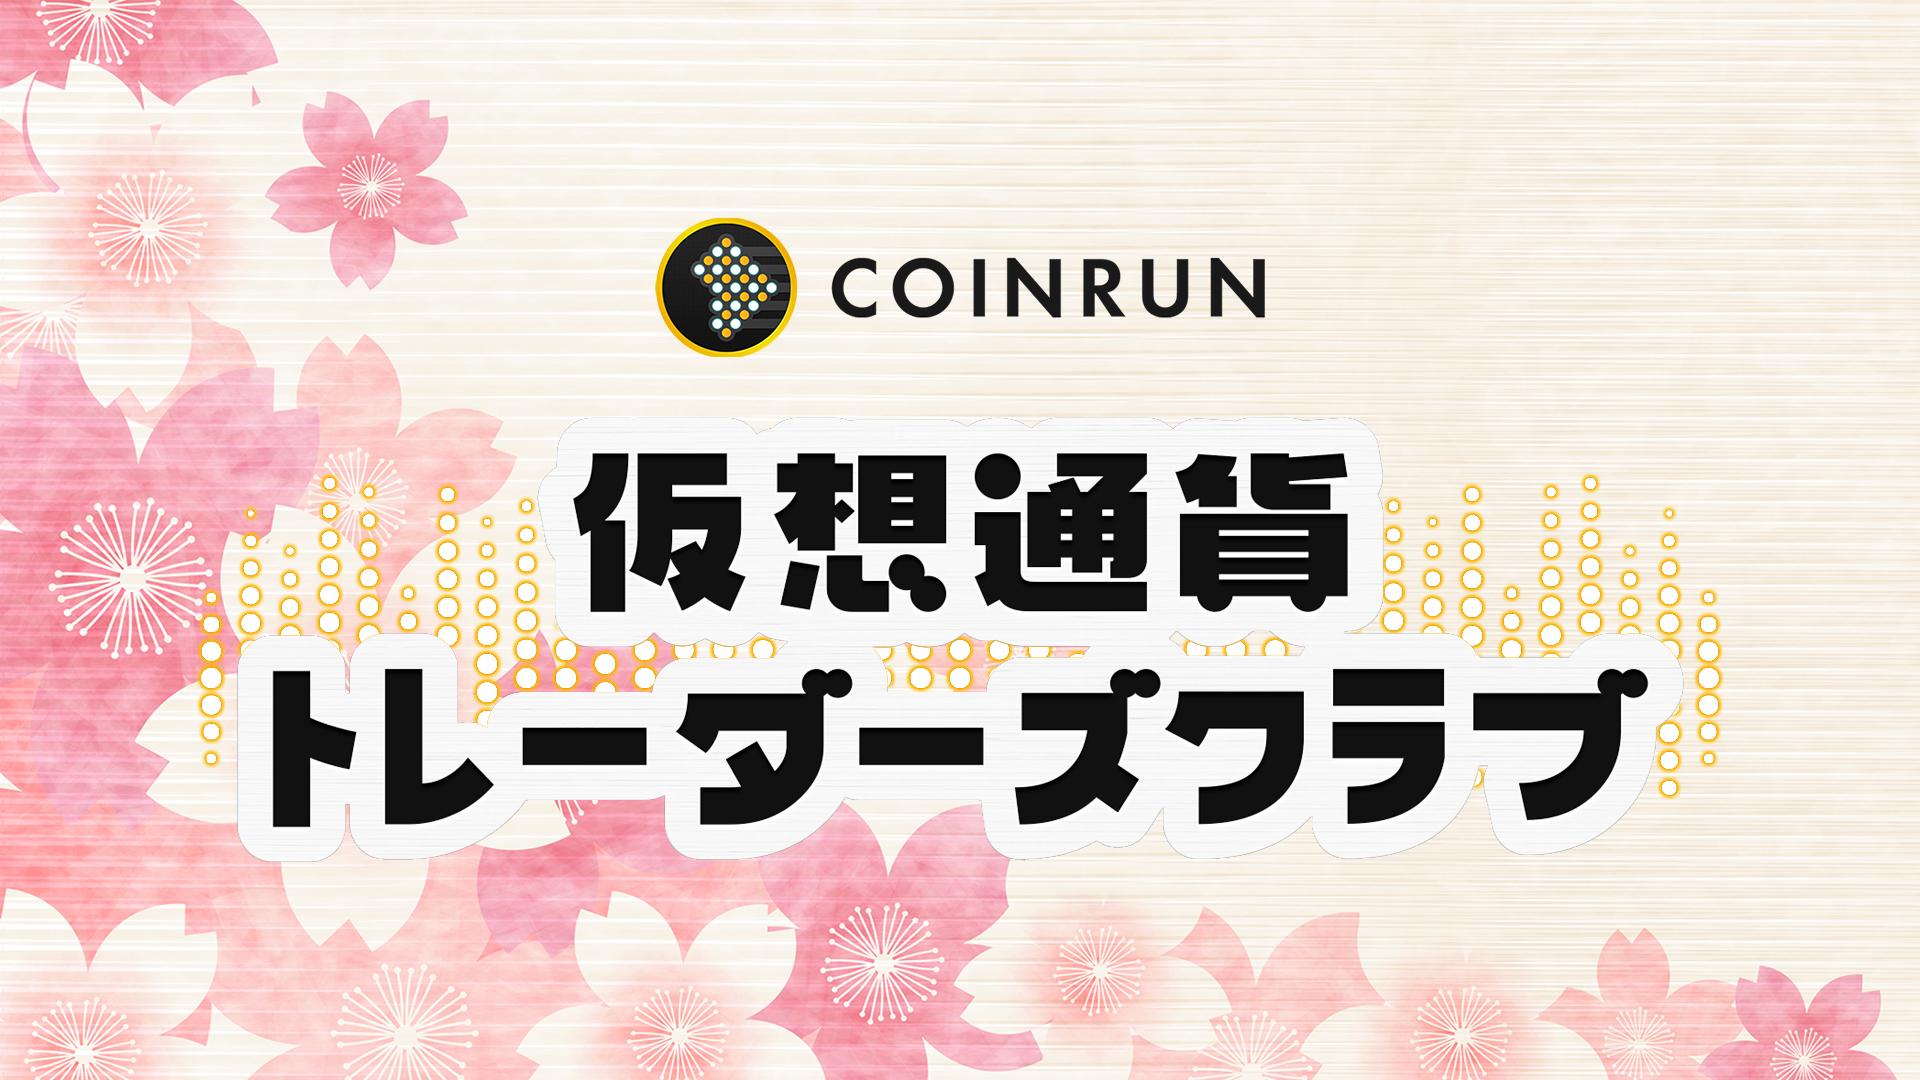 COINRUN - 仮想通貨トレーダーズクラブ COINRUN - DMM オンラインサロン